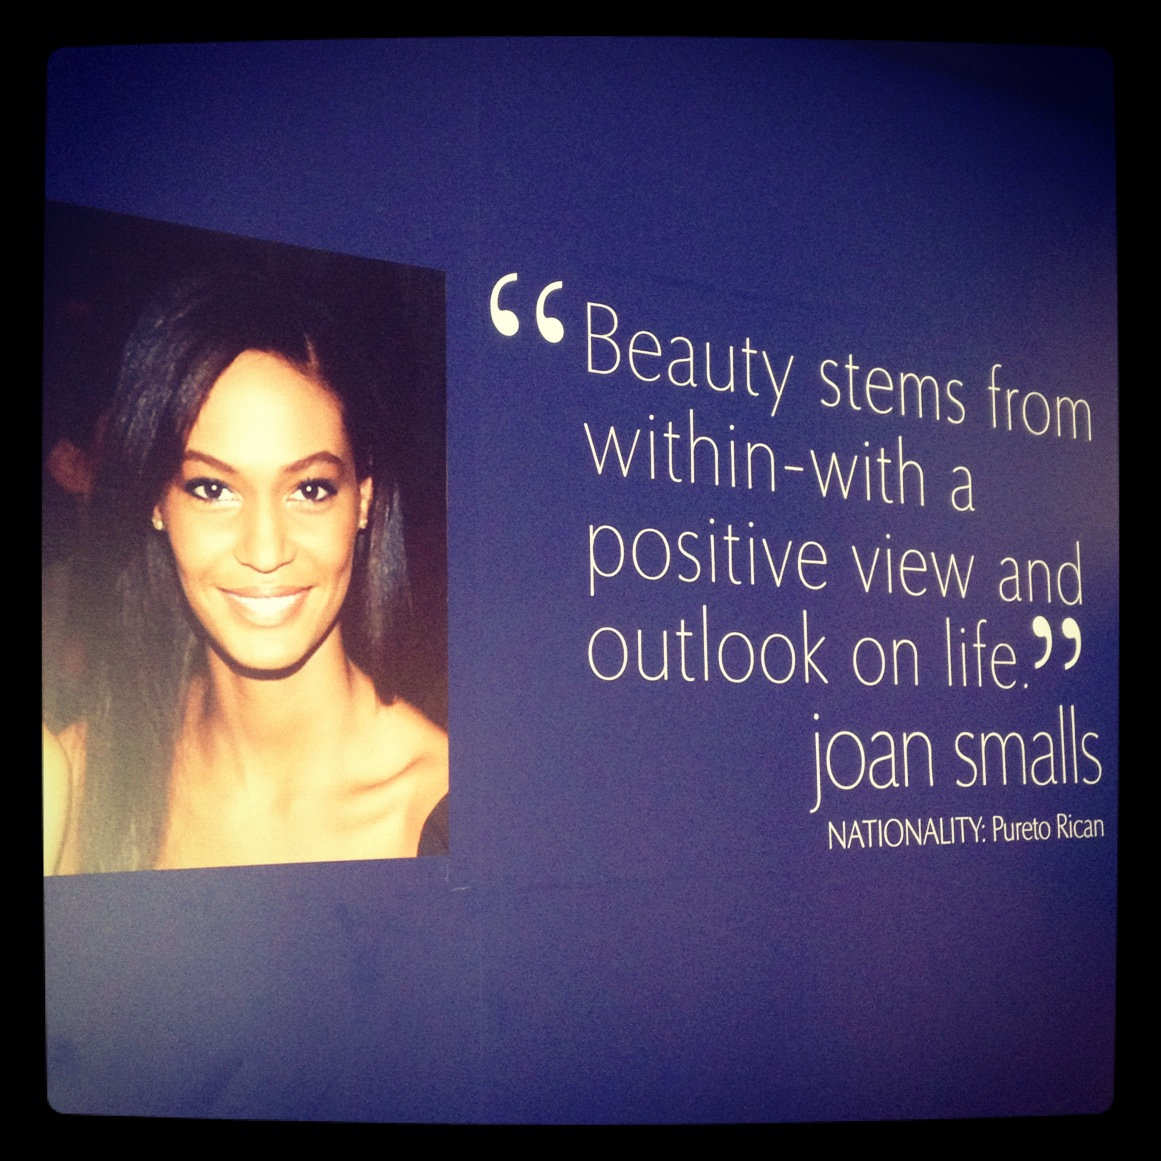 Joan Smalls's quote #1